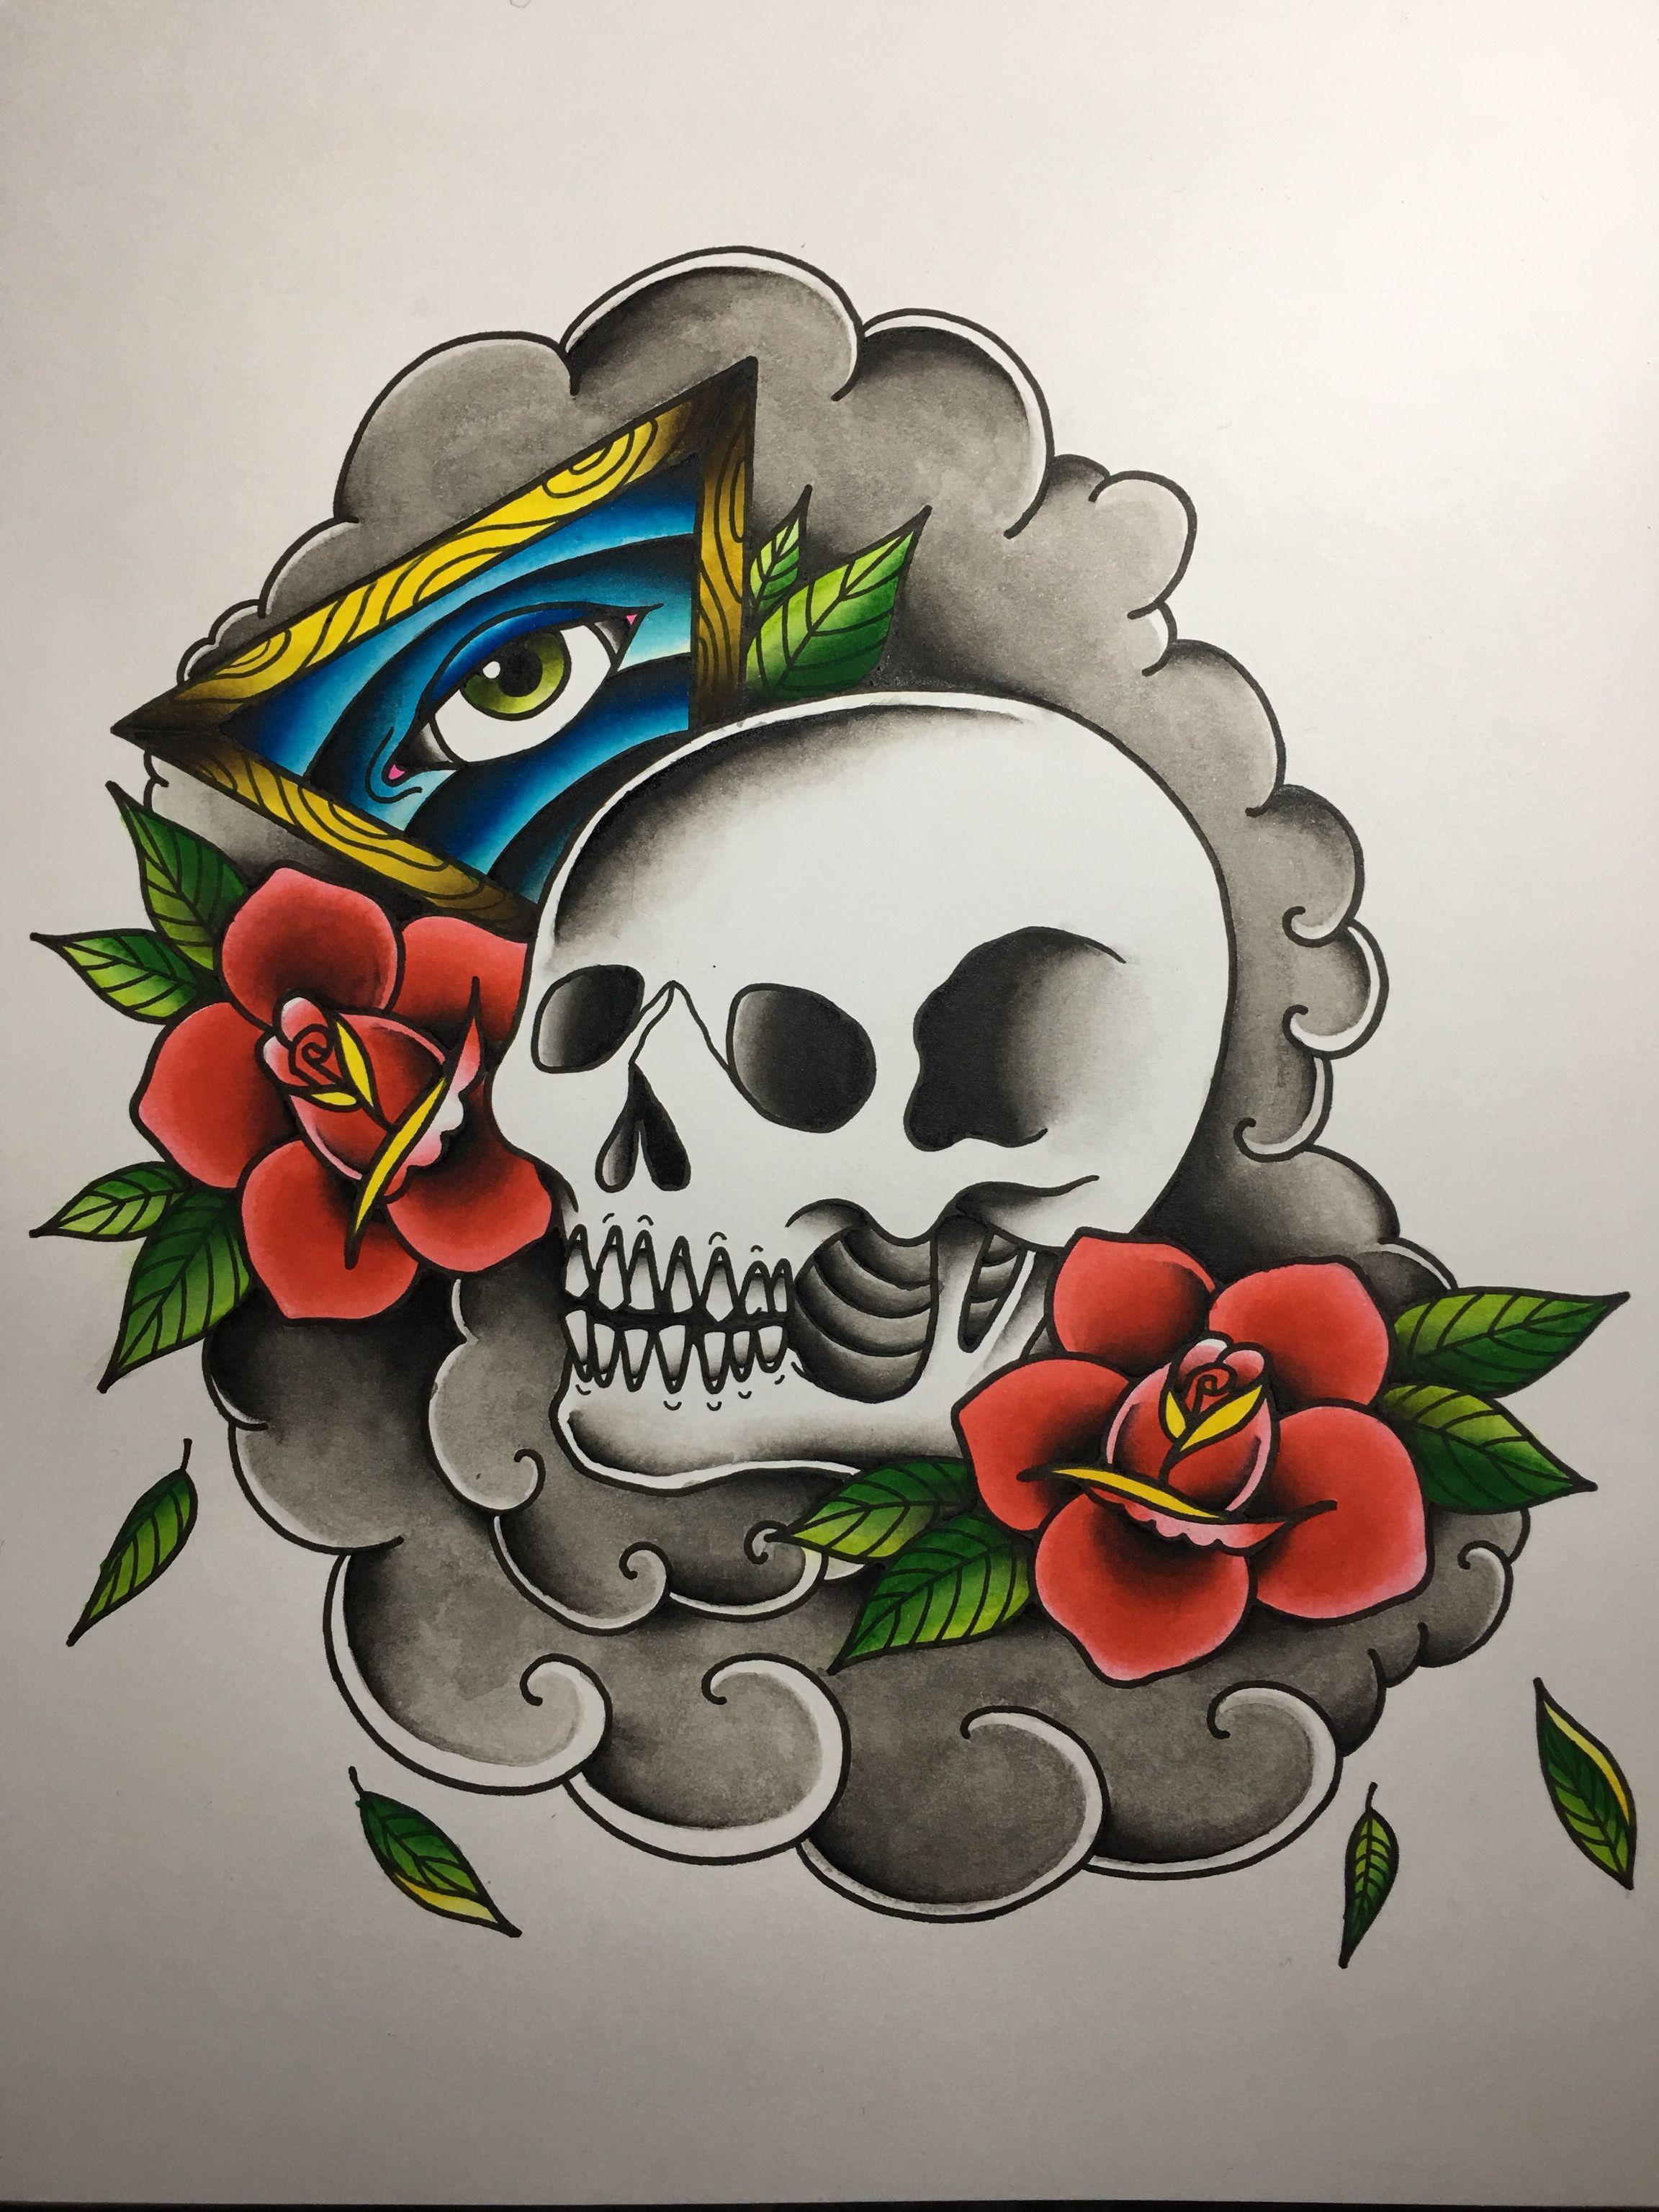 American Traditional Tattoo Skull : american, traditional, tattoo, skull, Skull, American, Traditional, Tattoo, Design, Design,, Tattoo,